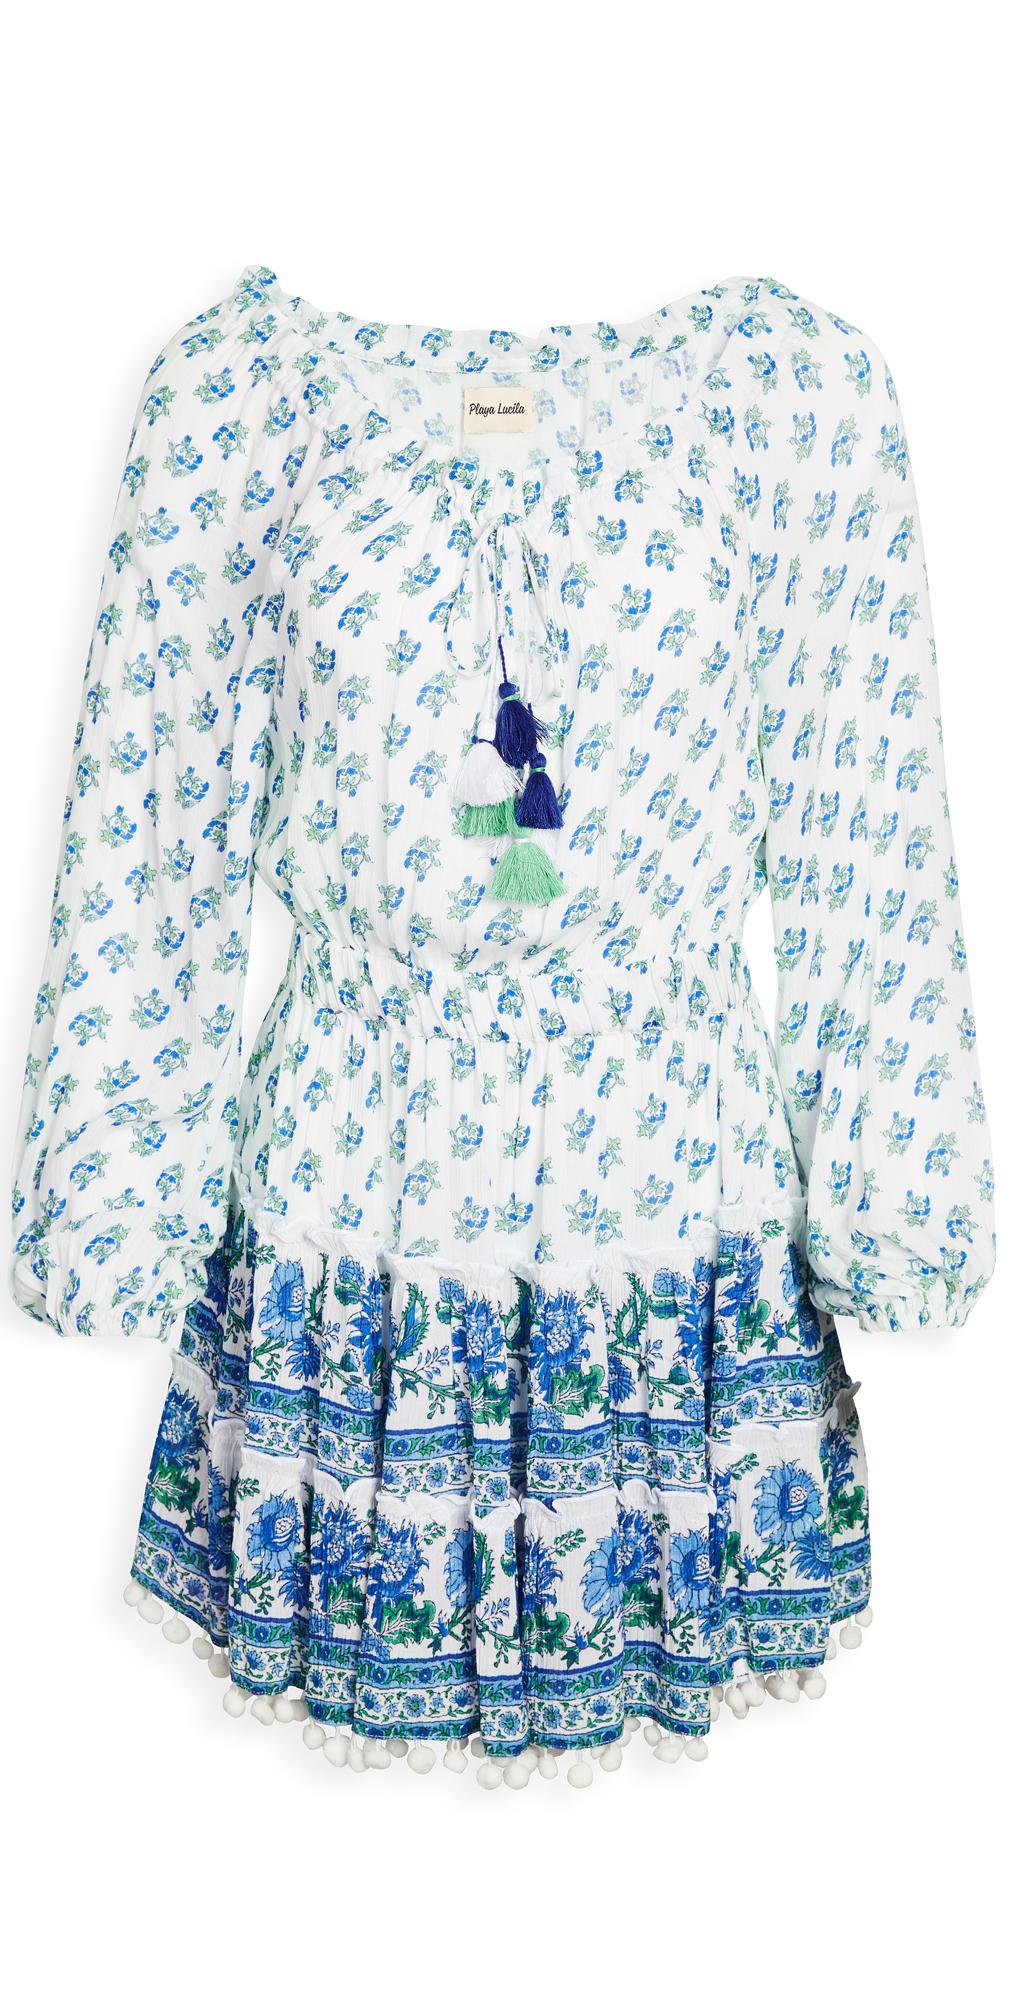 Playa Lucila Printed Short Dress